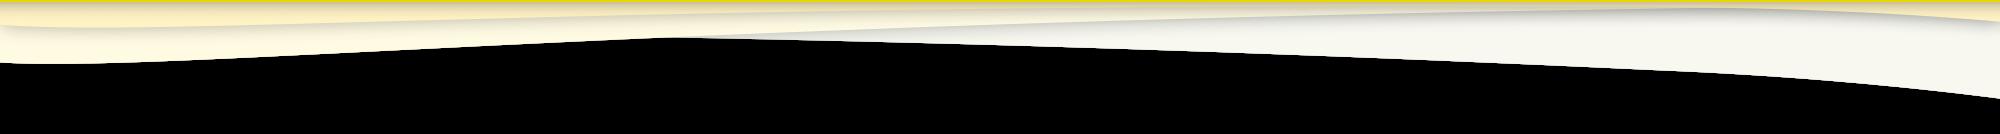 Horizontale Streifen in Wellenform